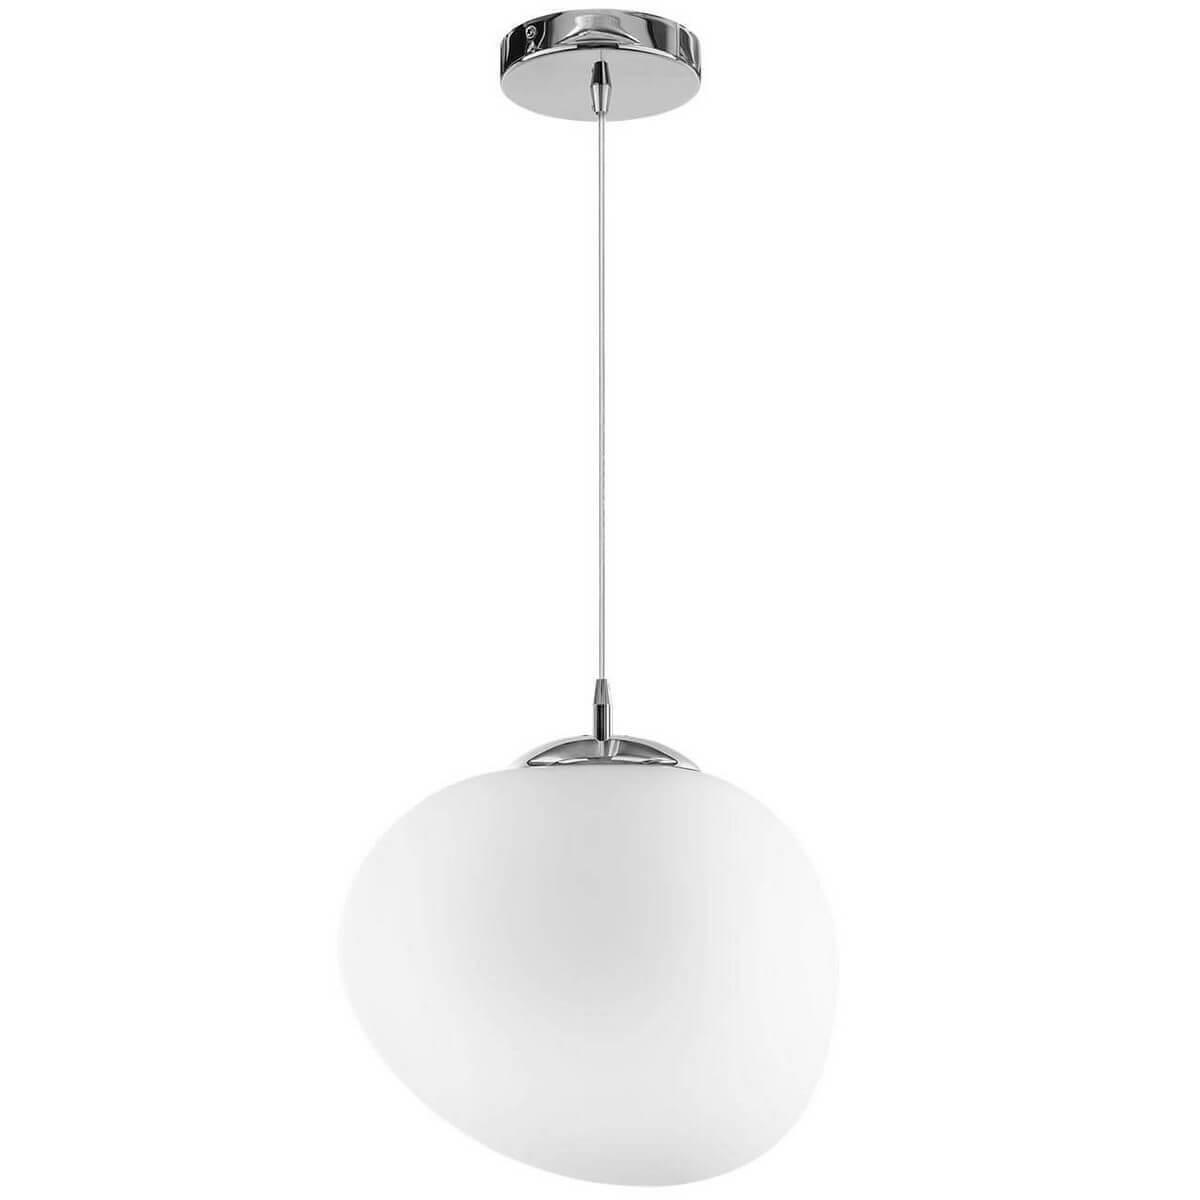 Светильник Lightstar 805016 Arnia подвесной светильник lightstar 805016